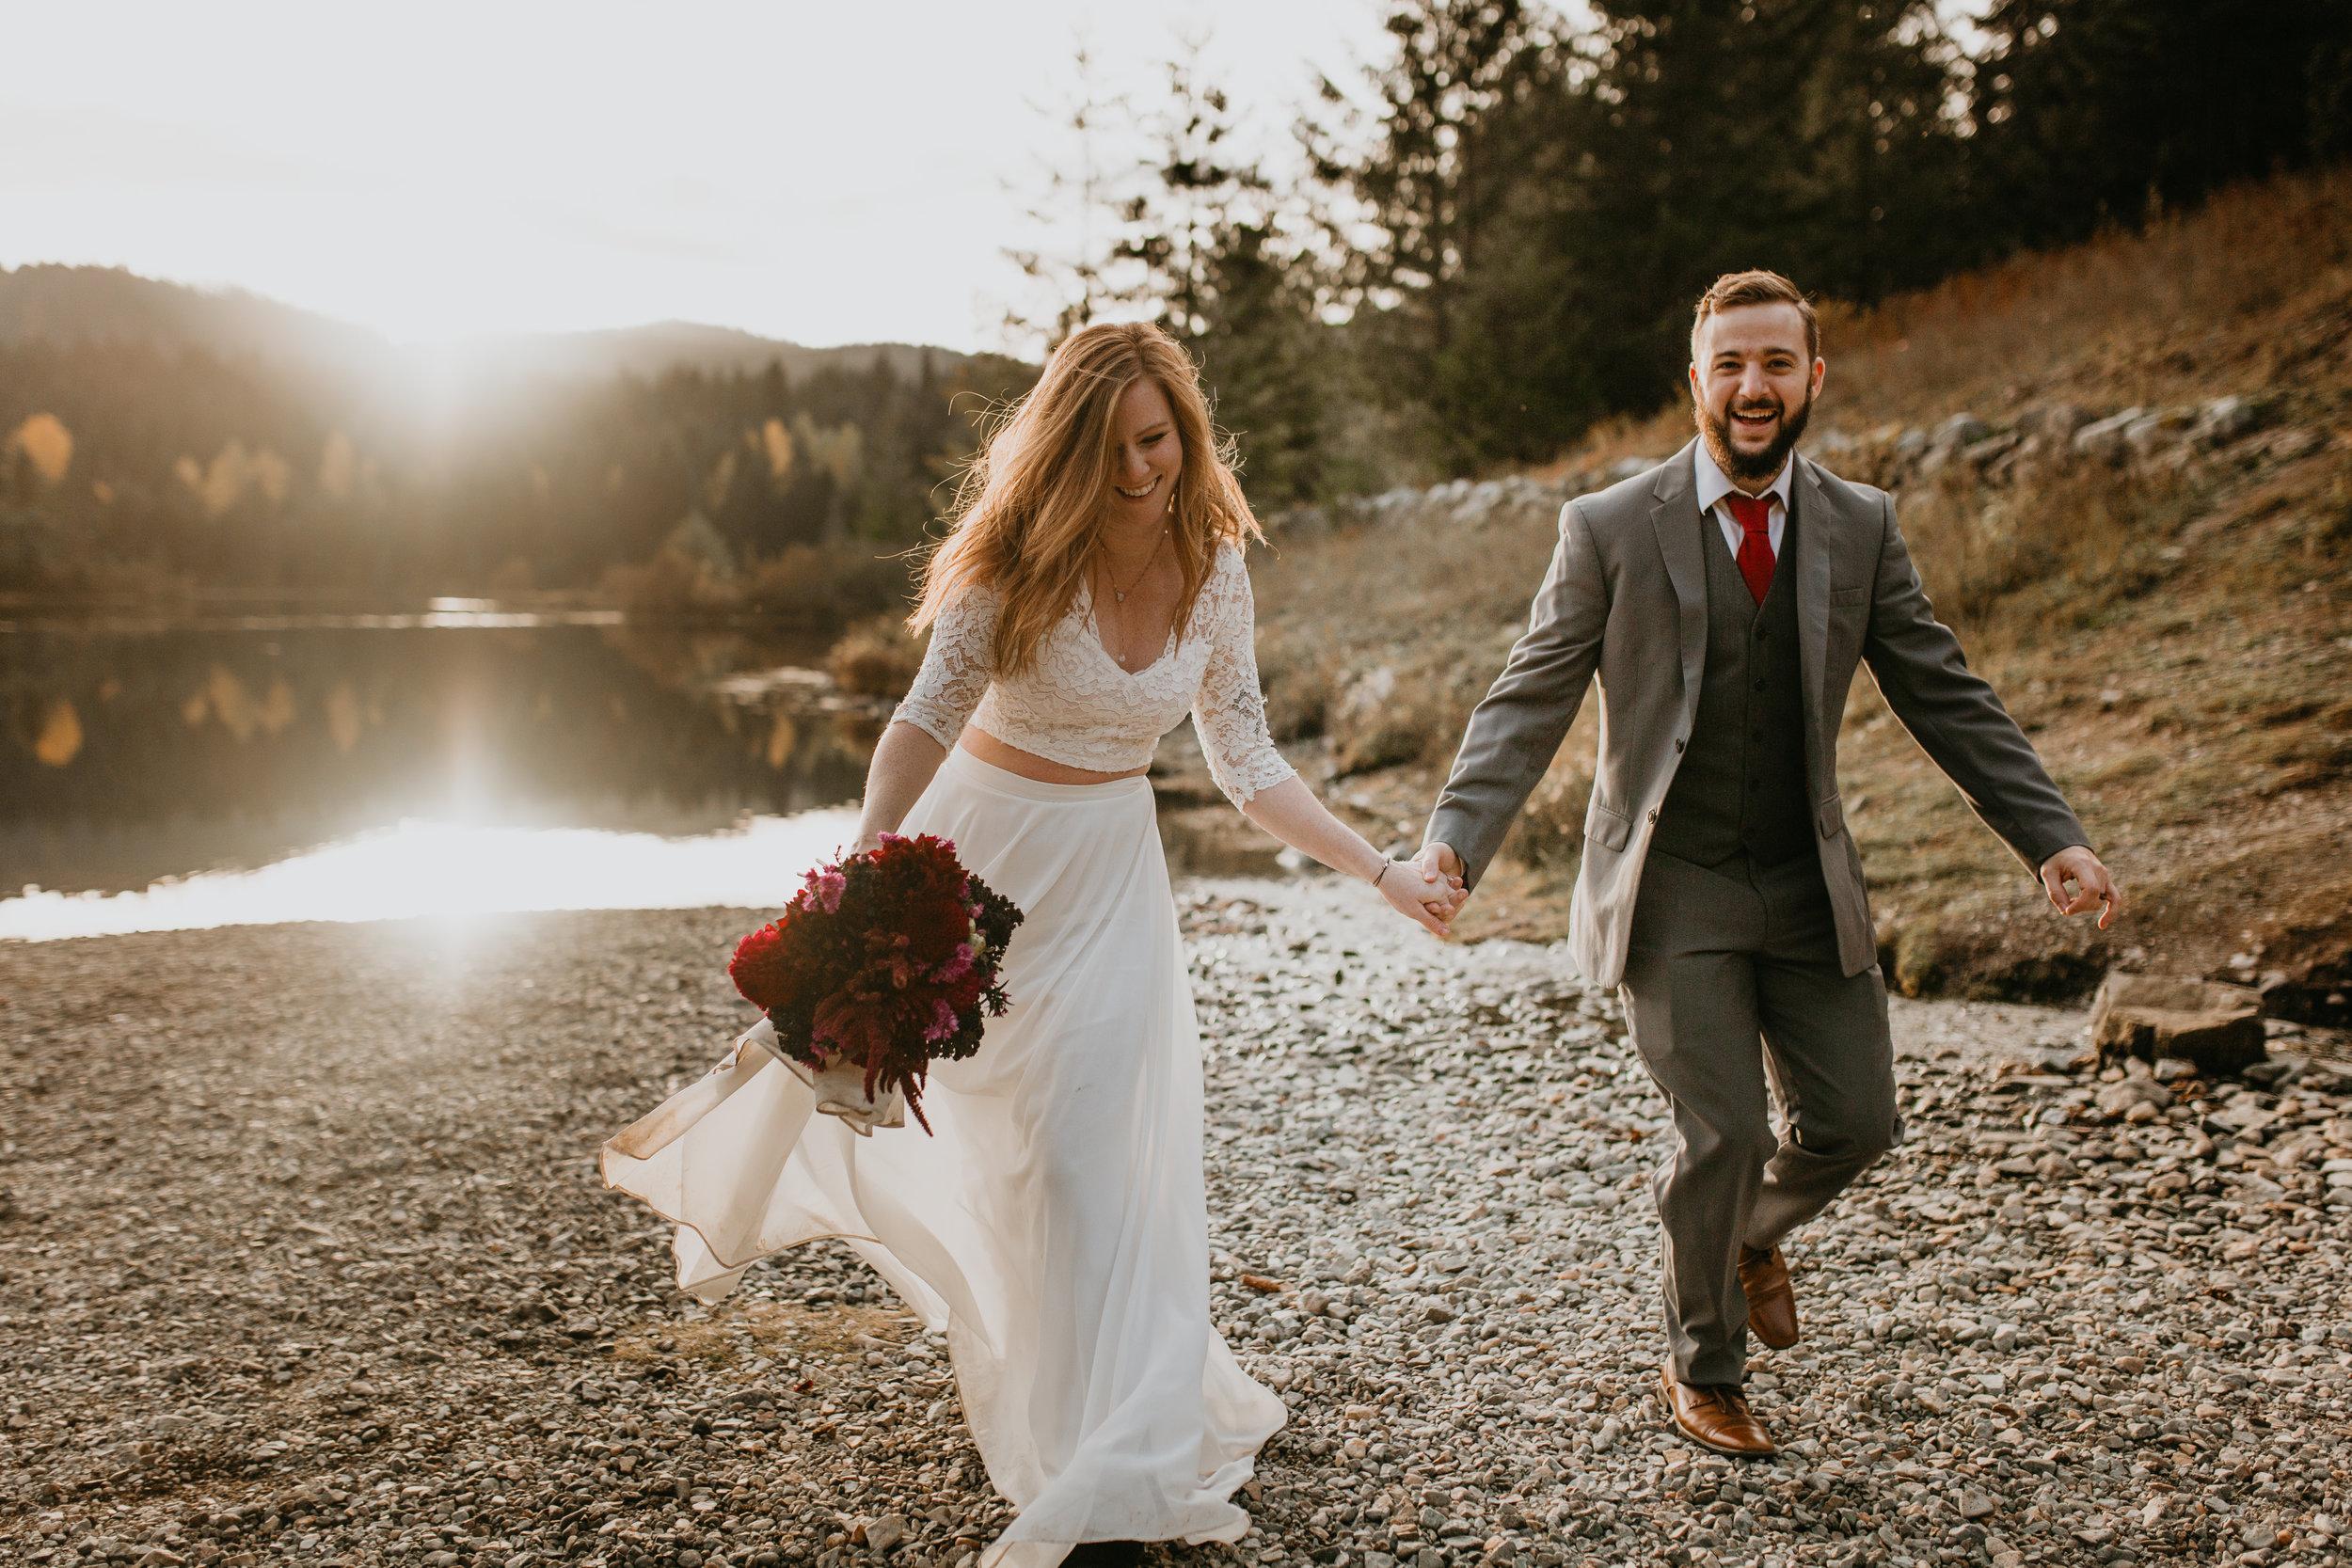 nicole-daacke-photography-mountain-view-elopement-at-gold-creek-pond-snoqualmie-washington-wa-elopement-photographer-photography-adventure-elopement-in-washington-fall-lakeside-golden-sunset-boho-fun-bride-0412.jpg